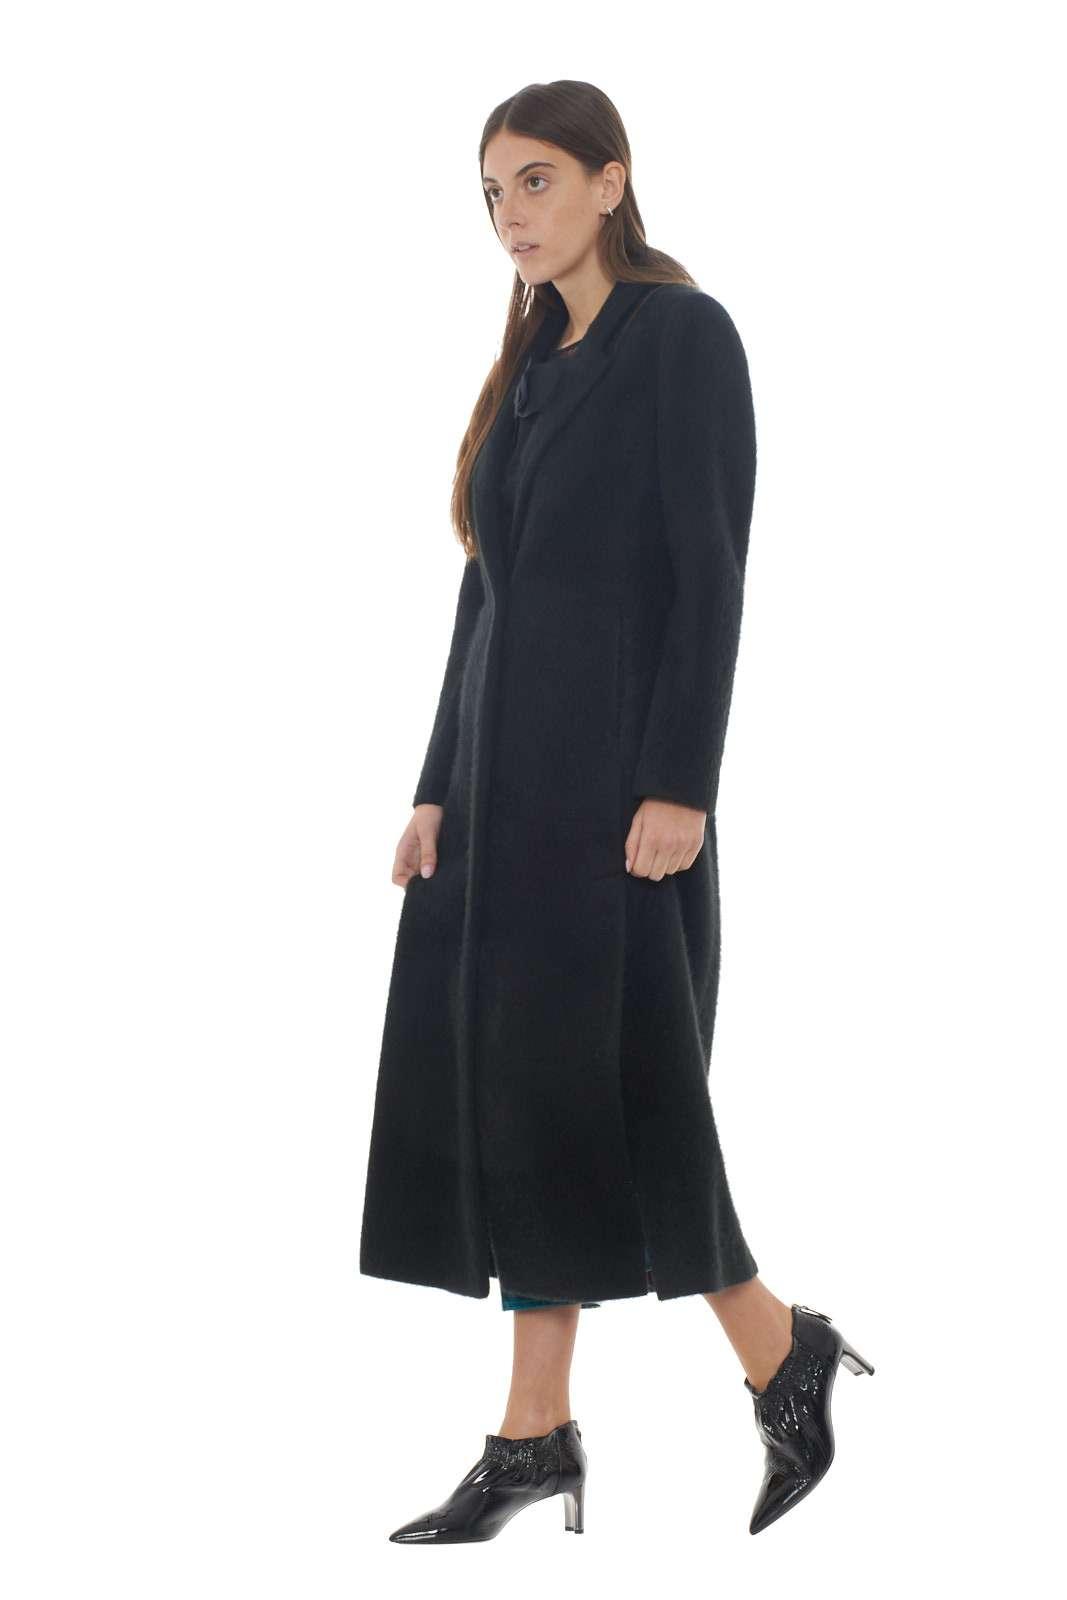 https://www.parmax.com/media/catalog/product/a/i/AI-outlet_parmax-cappotto-donna-Patrizia-Pepe-2S1261-B.jpg